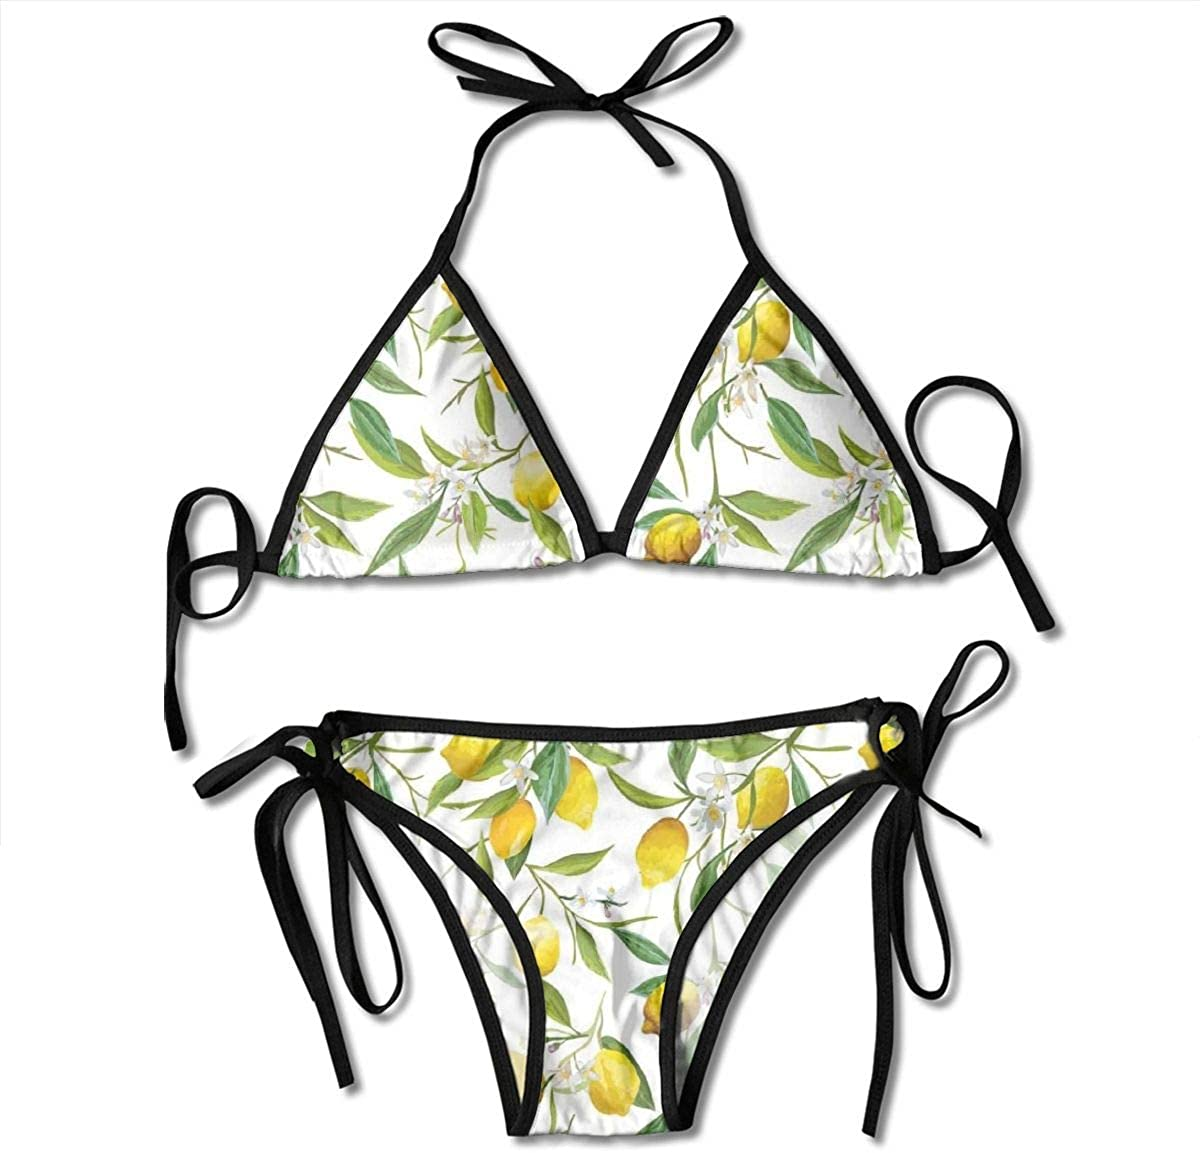 Women's Bikini Set,Hand Drawn Style Poinsettia Flowers Romantic Vintage Botanical Nature,Two Pieces Swimsuit